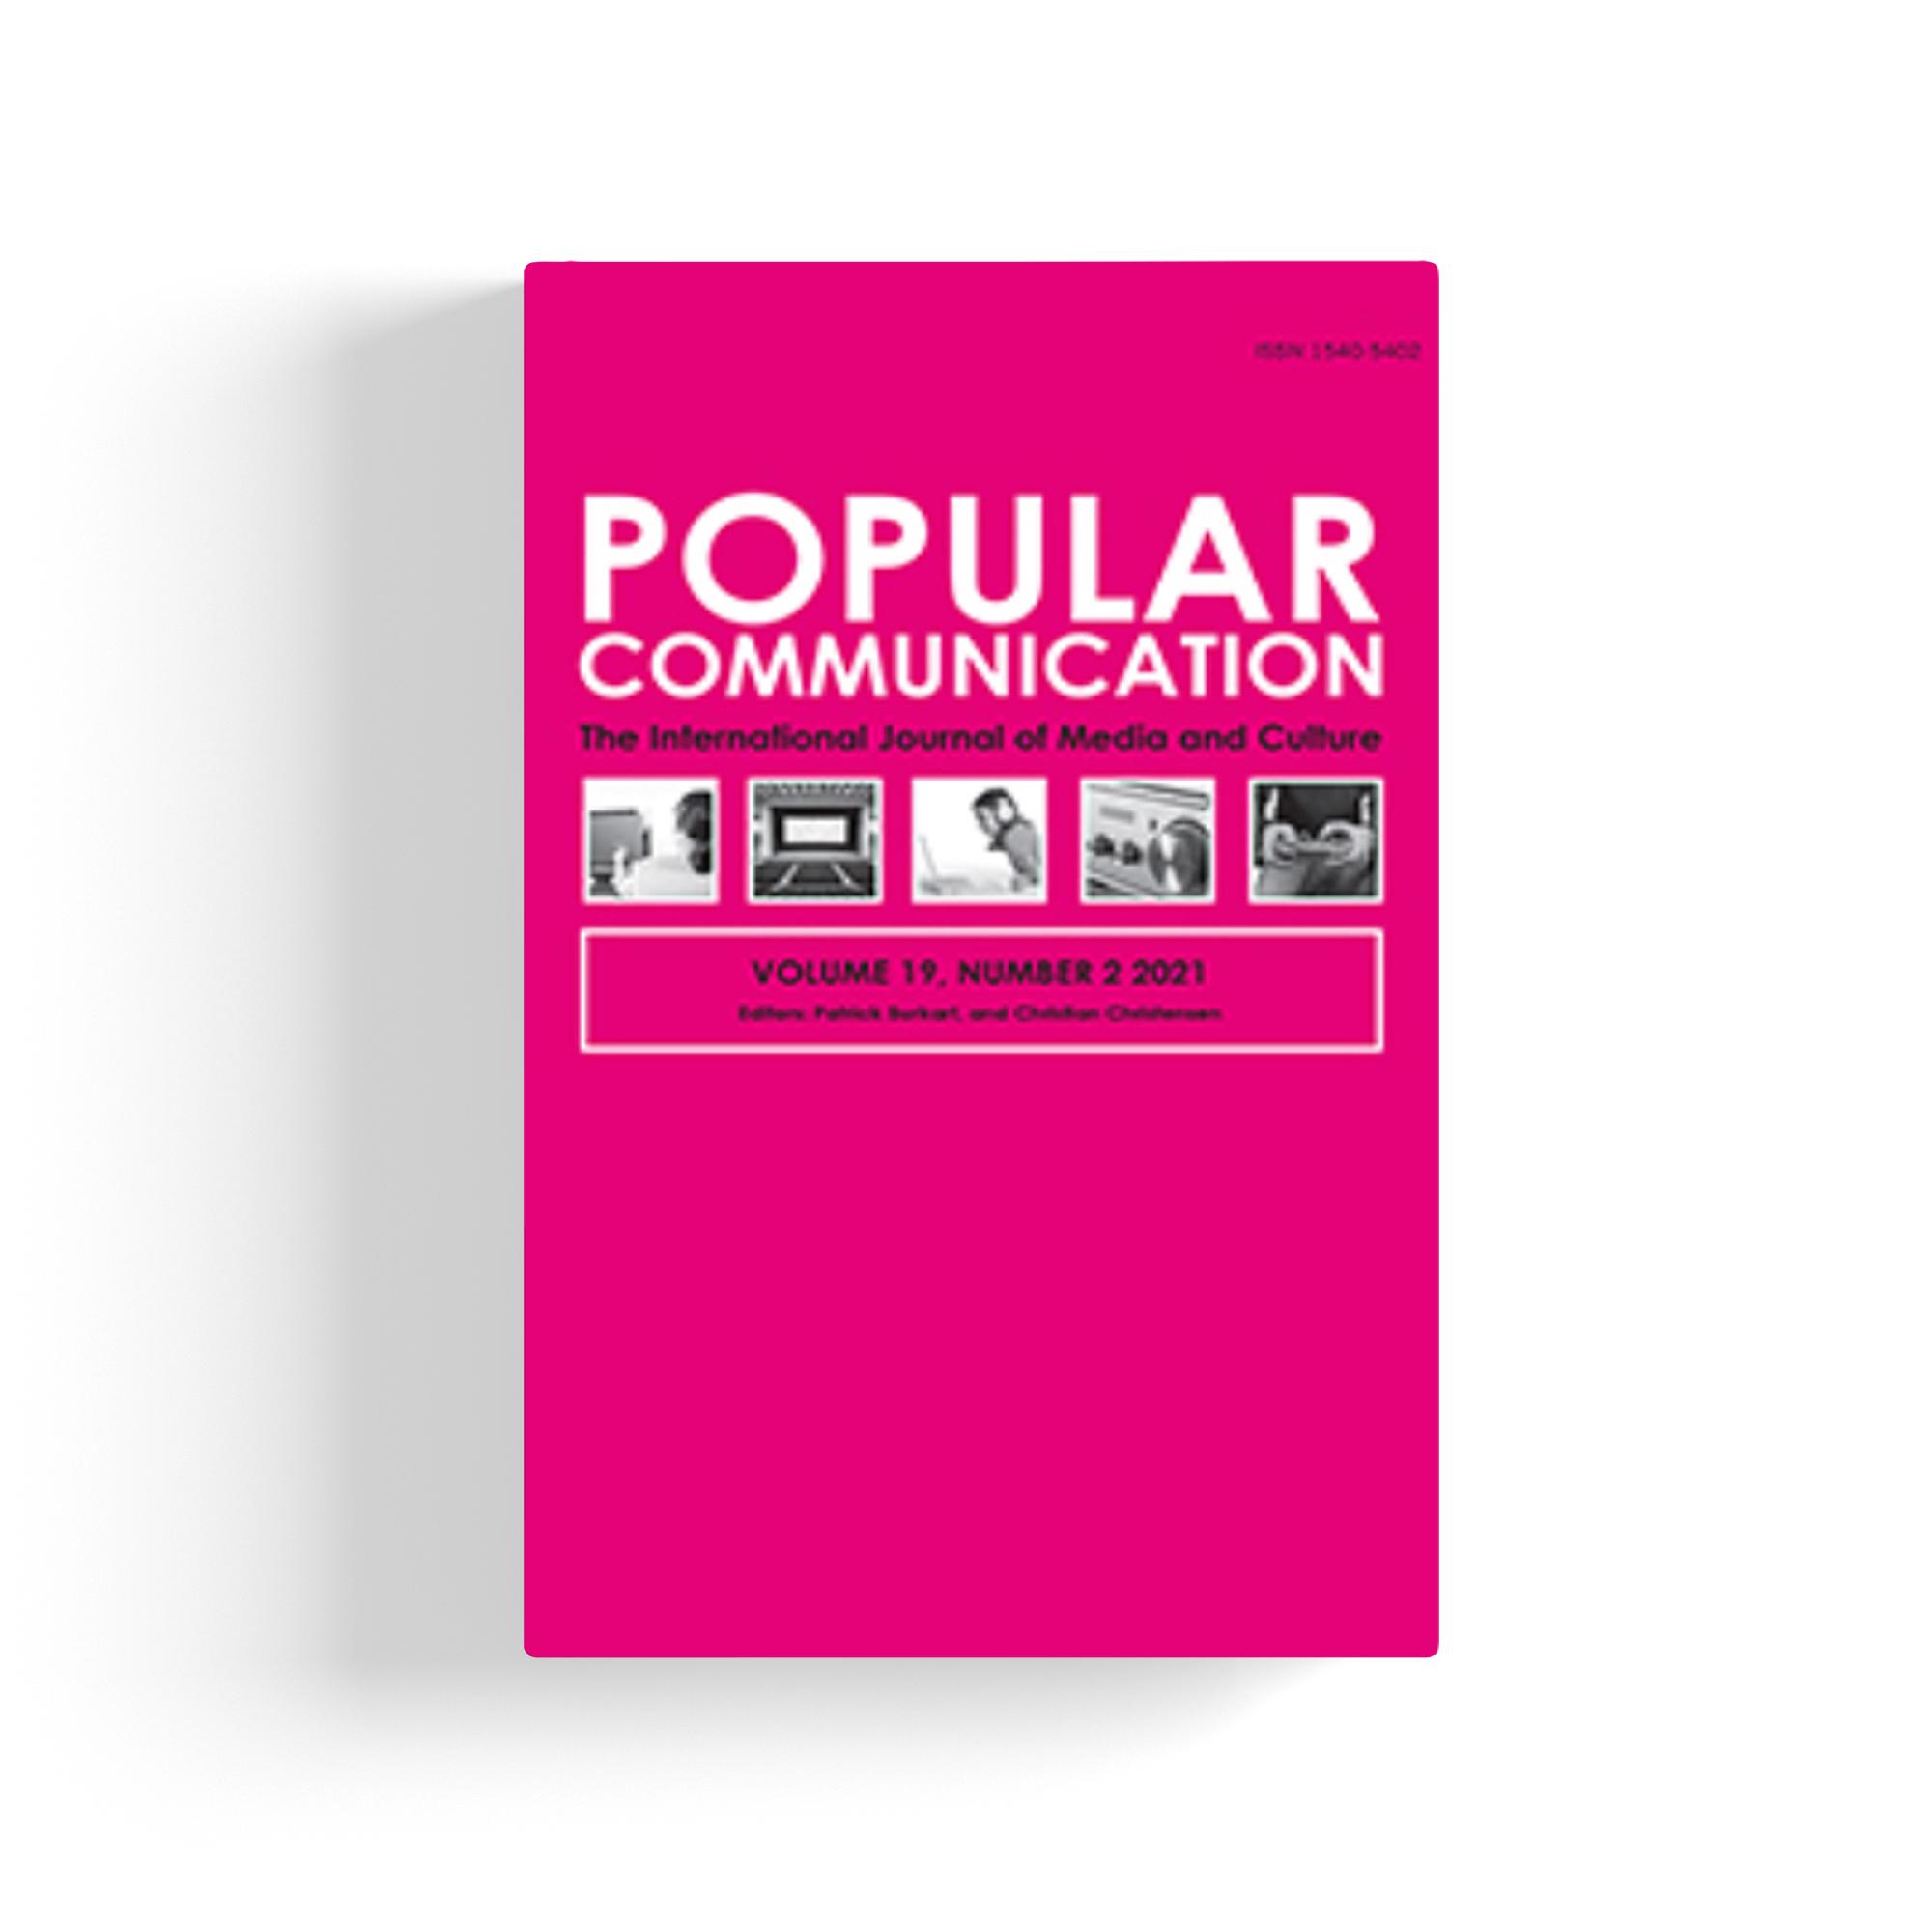 Popular Communication cover